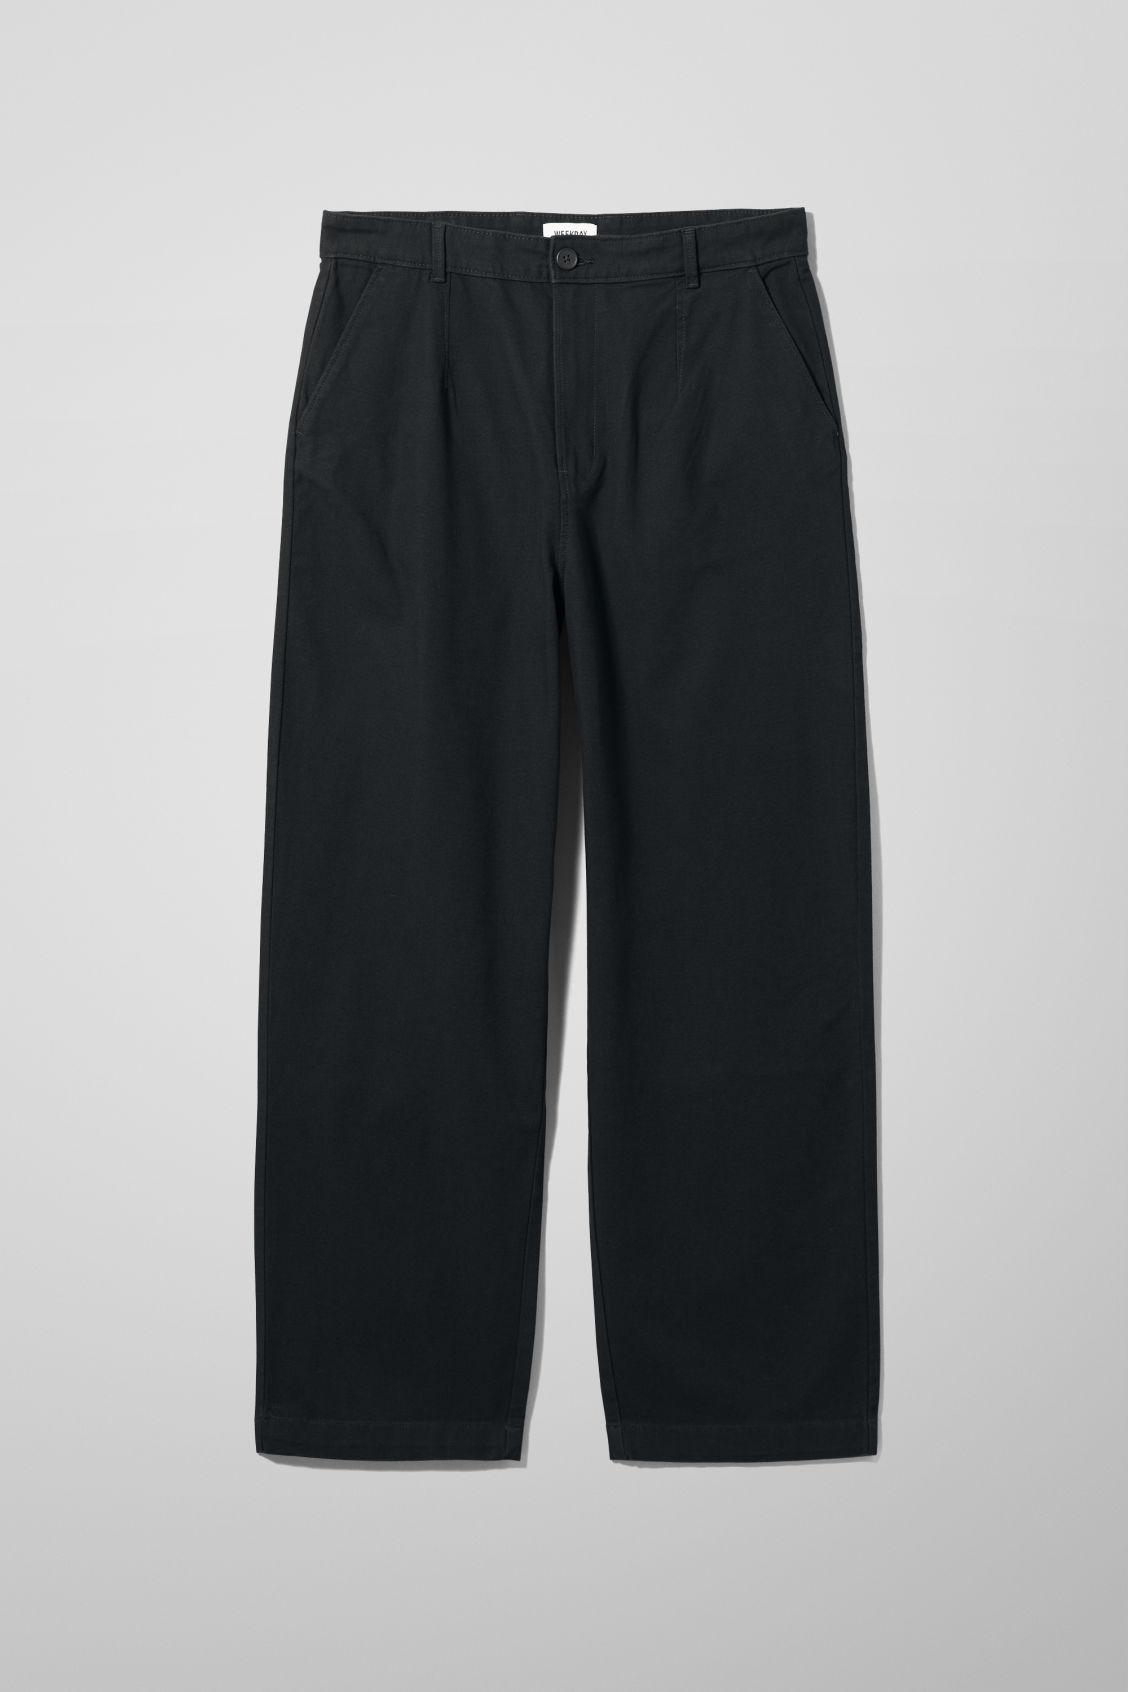 Mfon Trousers - Black